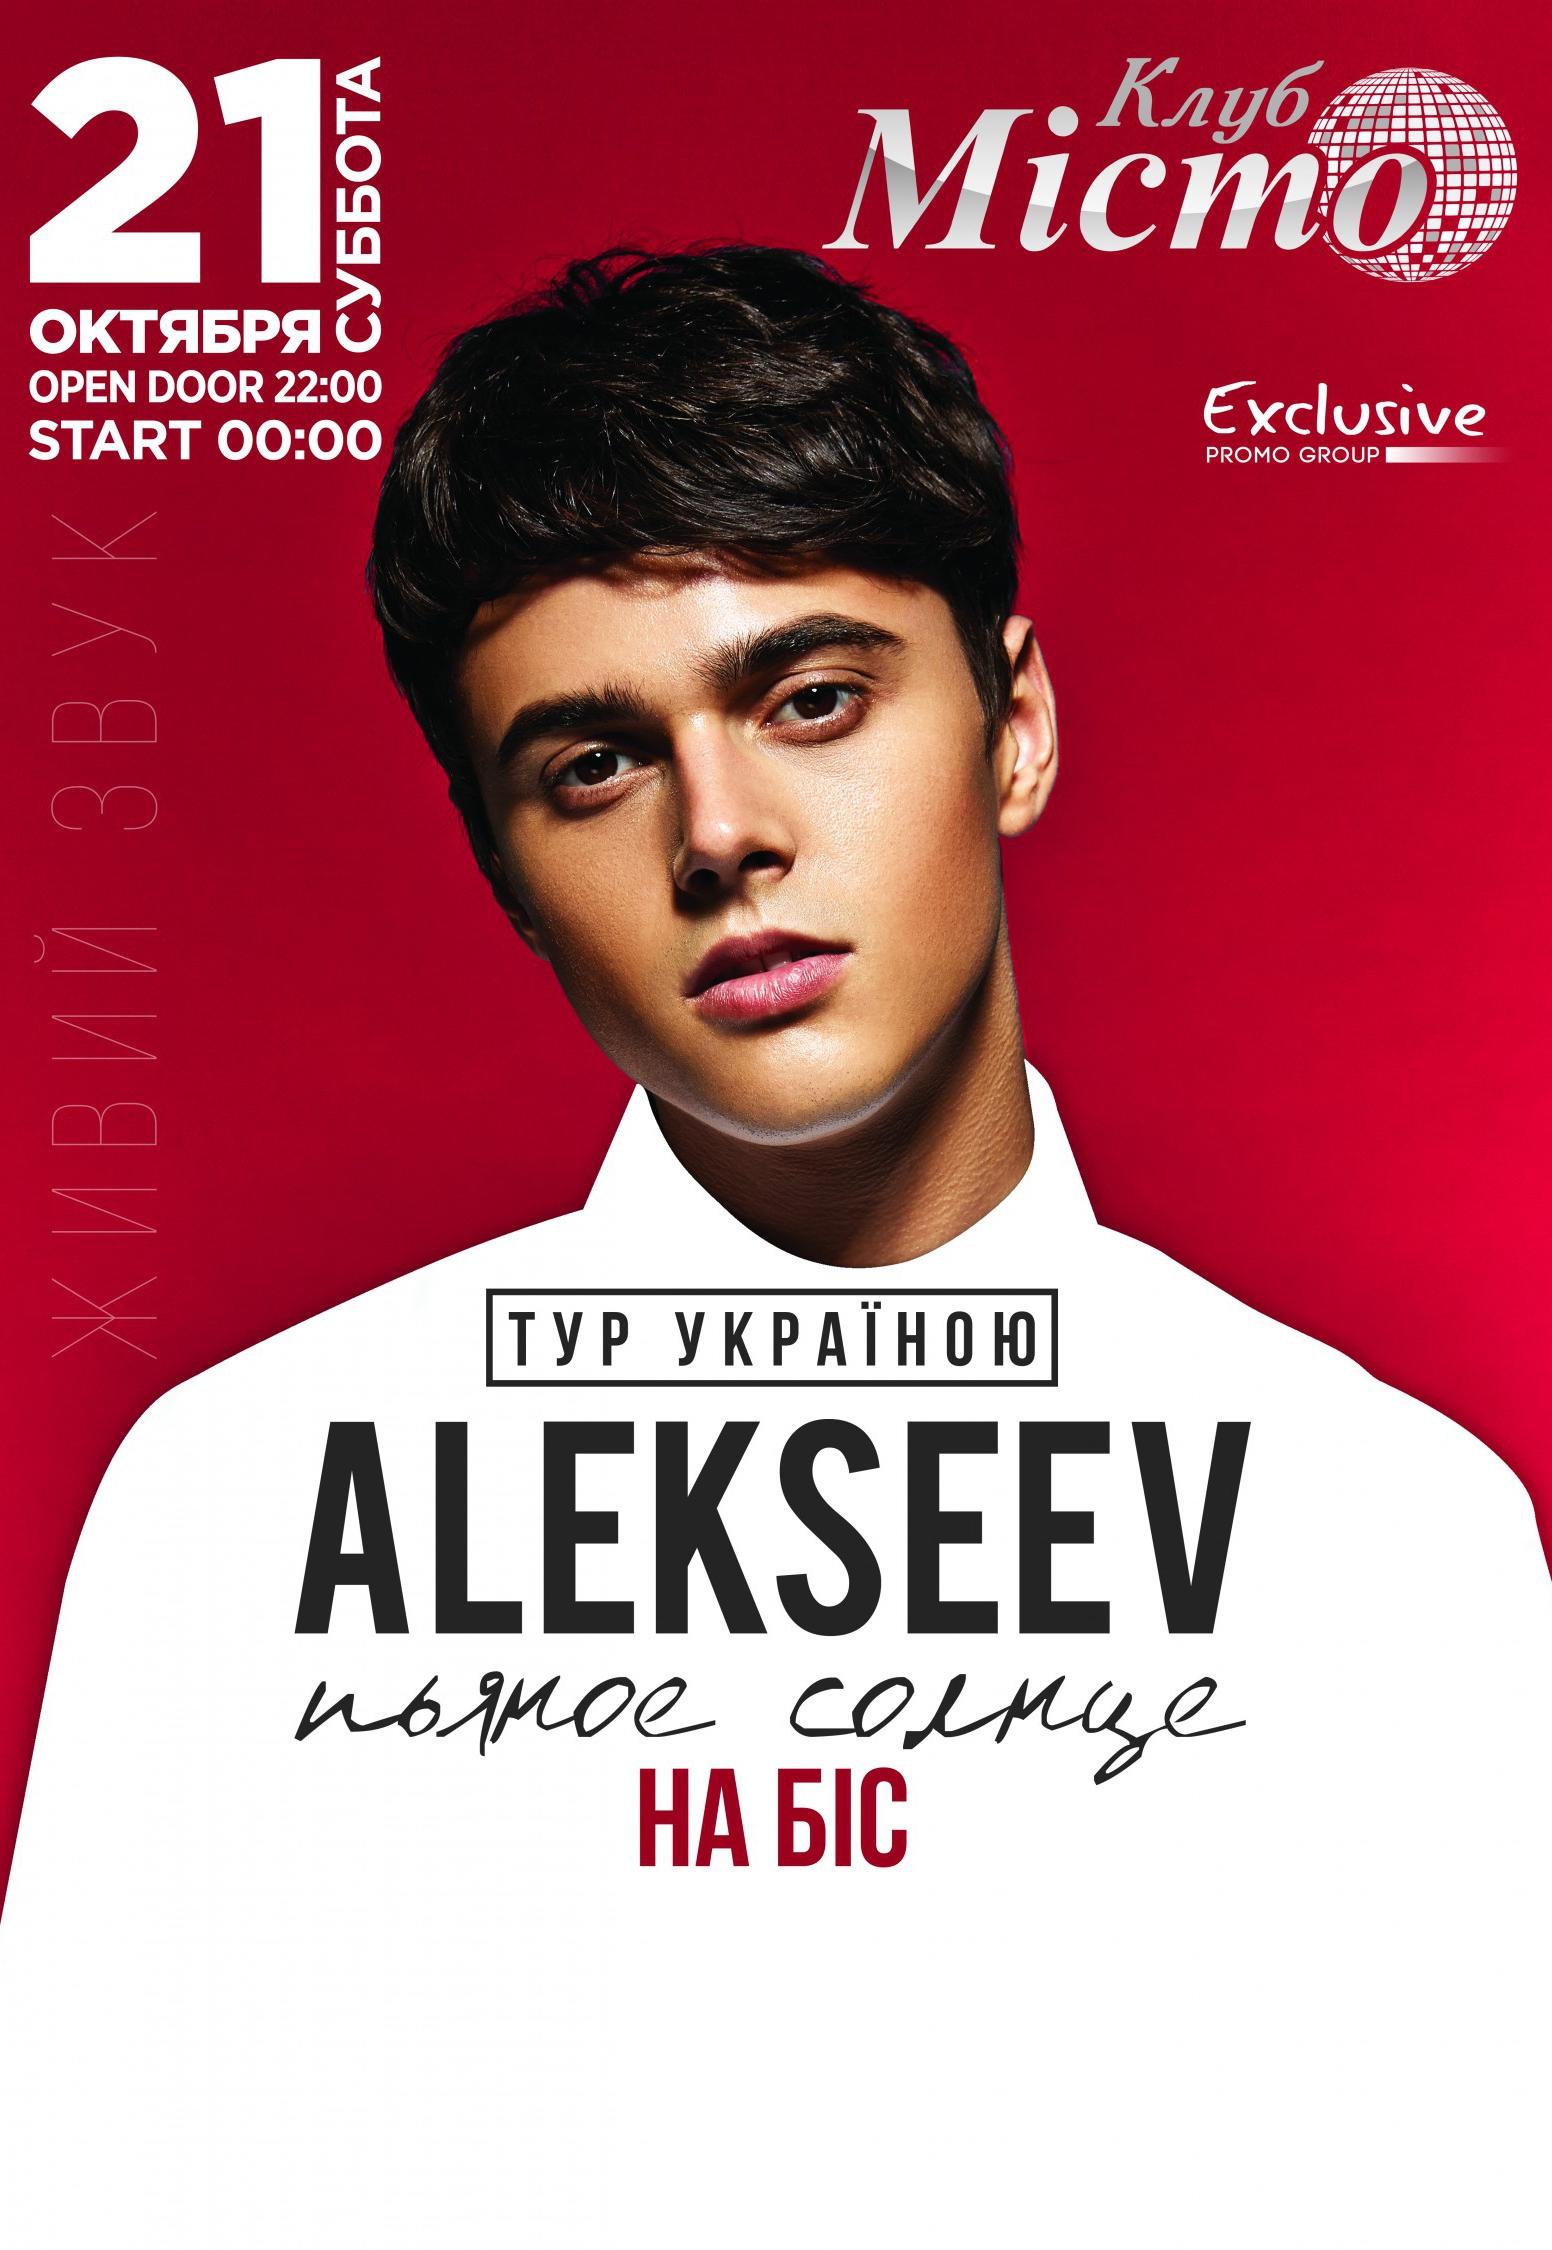 alekseev пьяное солнце на звонок